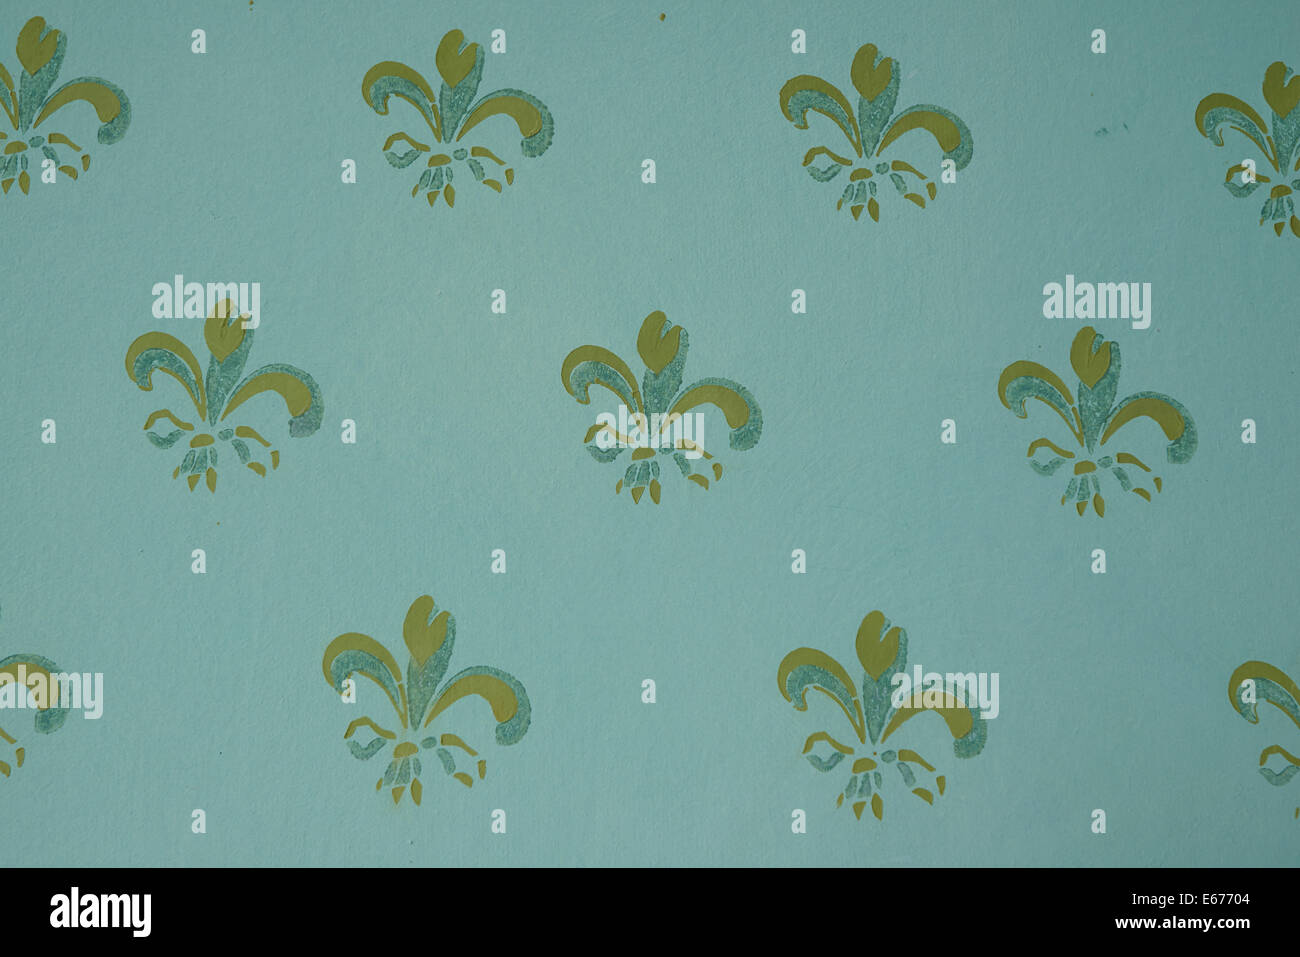 fleur de lis wallpaper stockfotos fleur de lis wallpaper bilder alamy. Black Bedroom Furniture Sets. Home Design Ideas